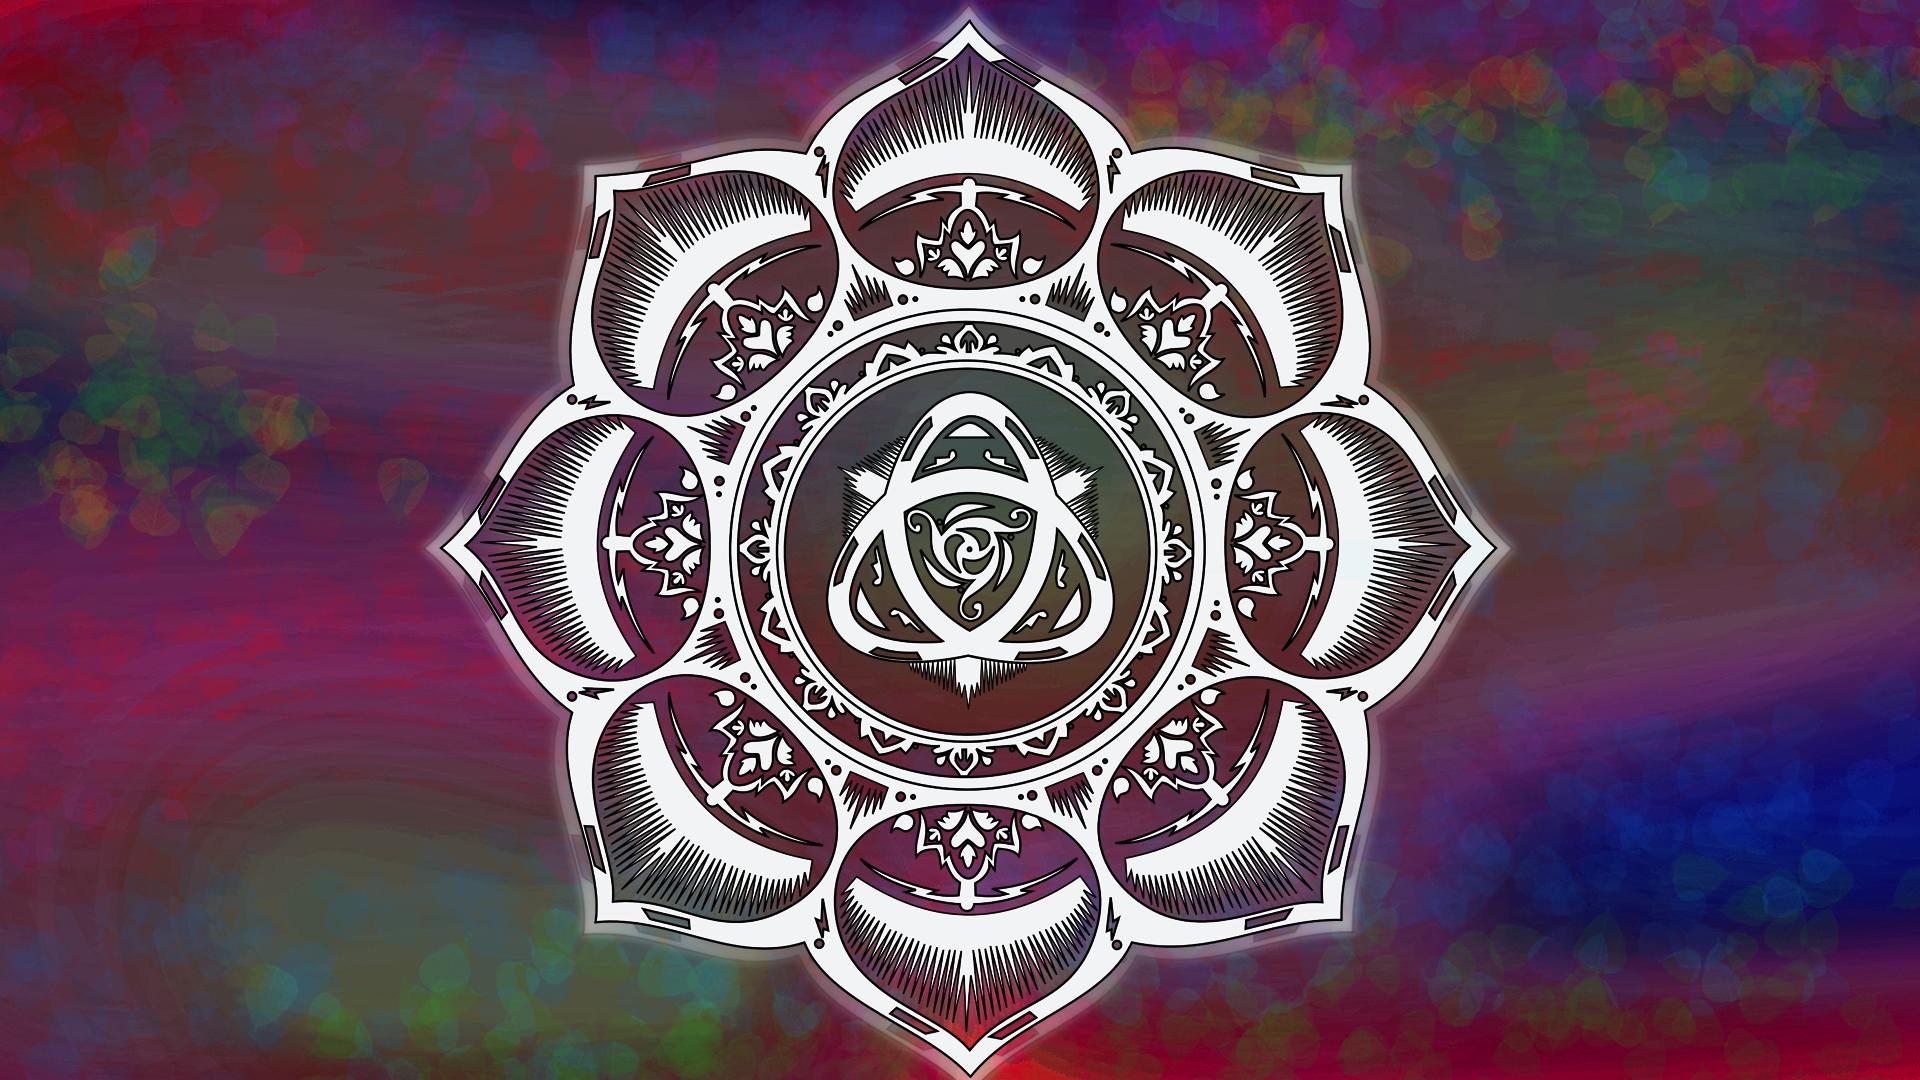 Dub Fx Wallpaper Theory Of Harmony By Devonaitor On Deviantart